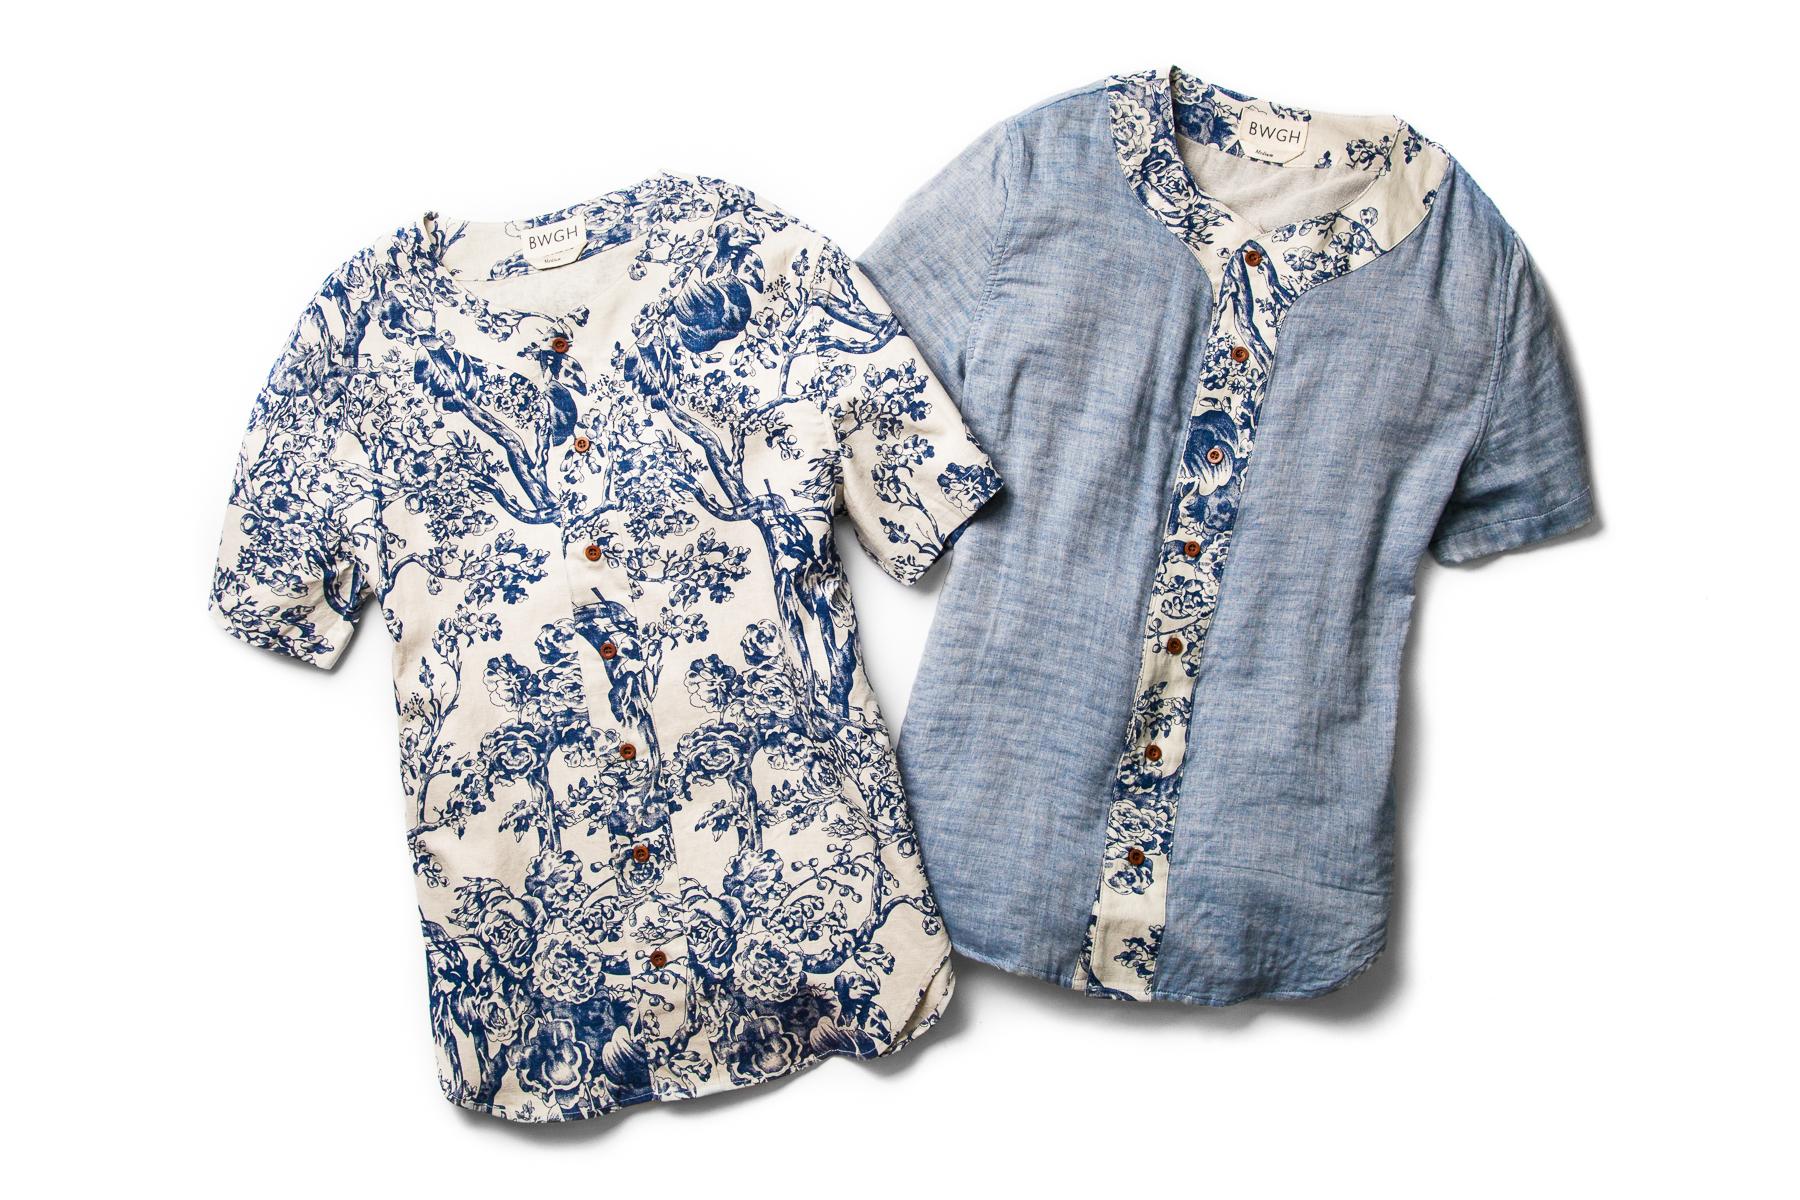 BWGH 2014 Spring/Summer Baseball Shirts